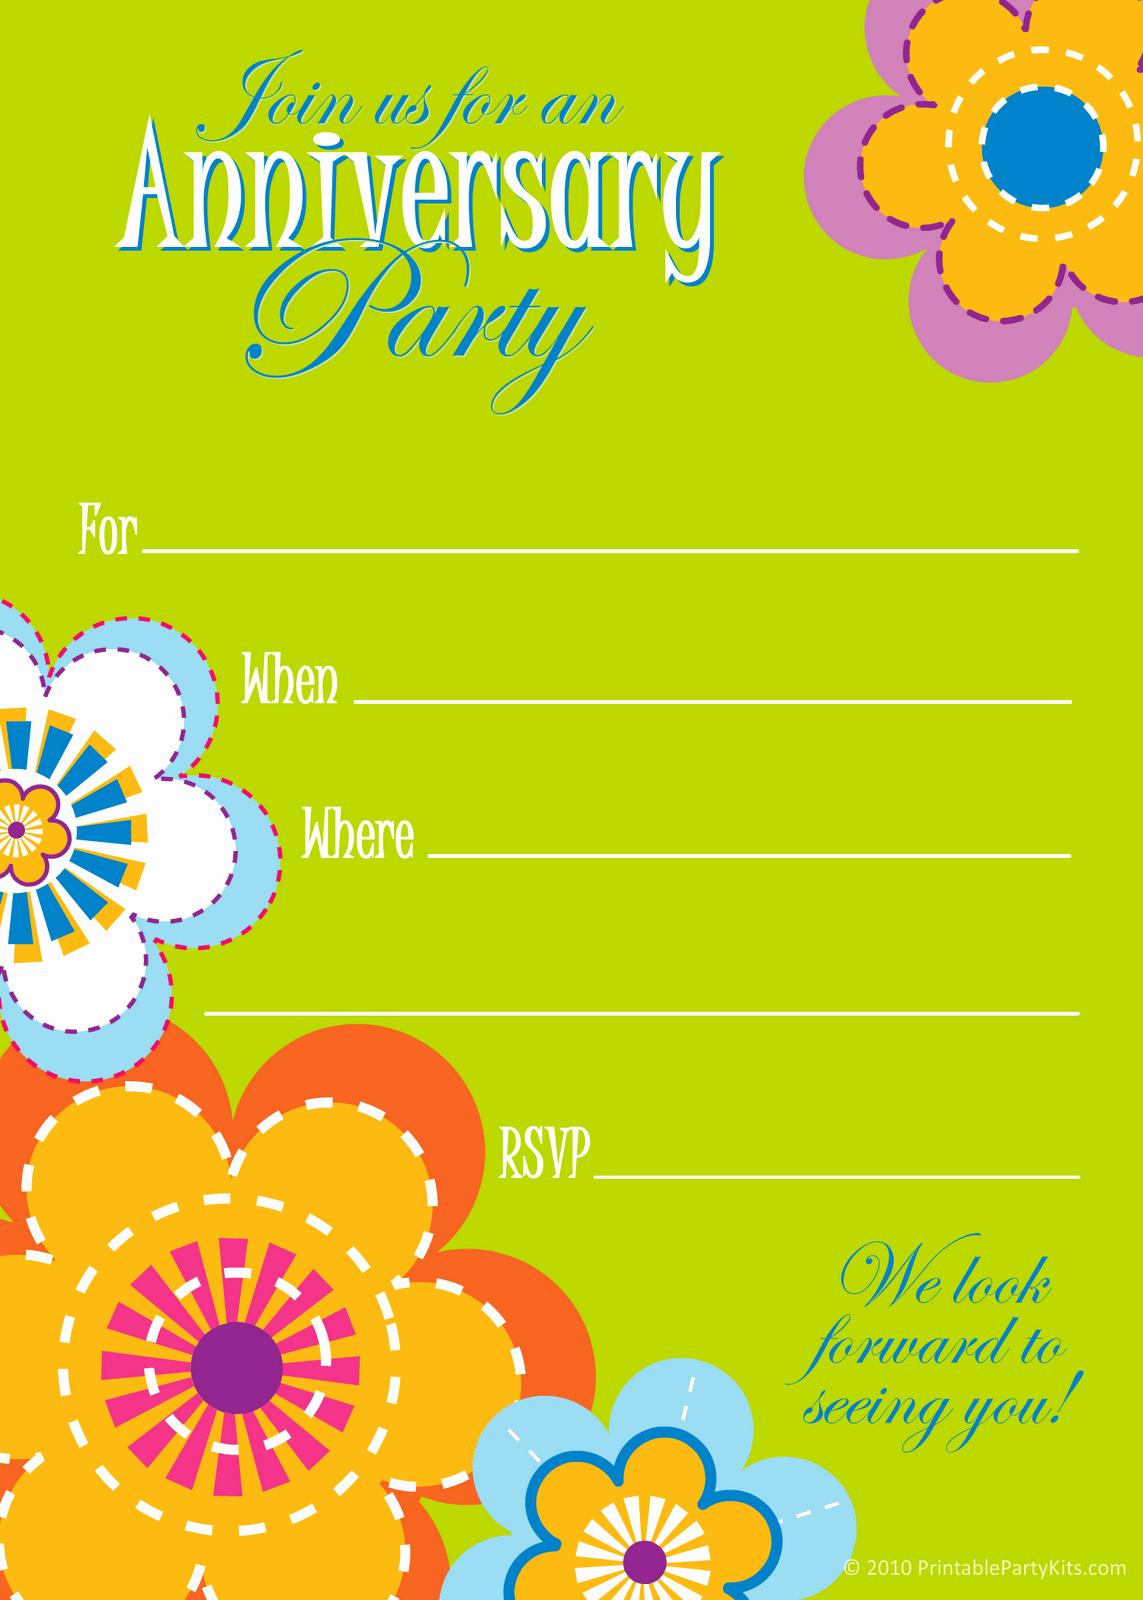 Wedding Anniversary Invitation Templates Inspirational Wedding Anniversary Invitation Template Free